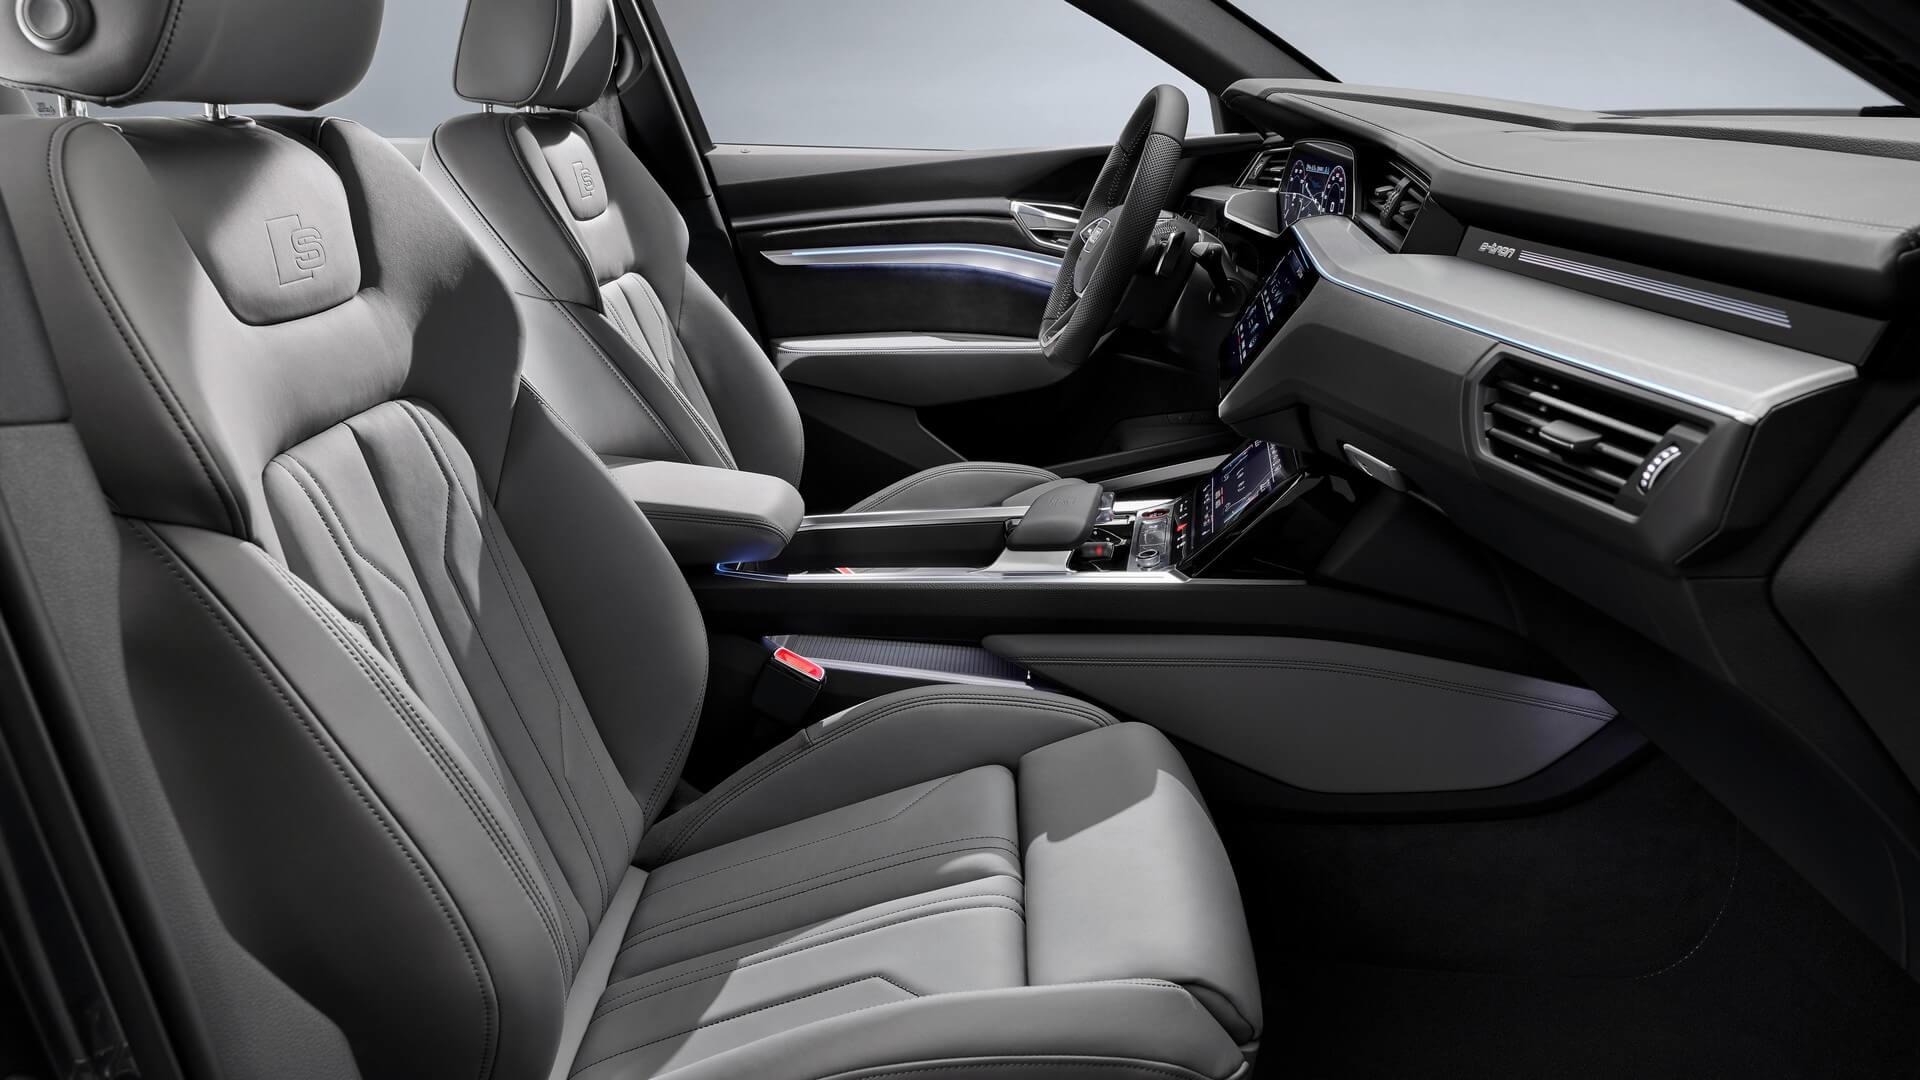 Audi-E-Tron-S-and-E-Tron-S-Sportback-2020-125